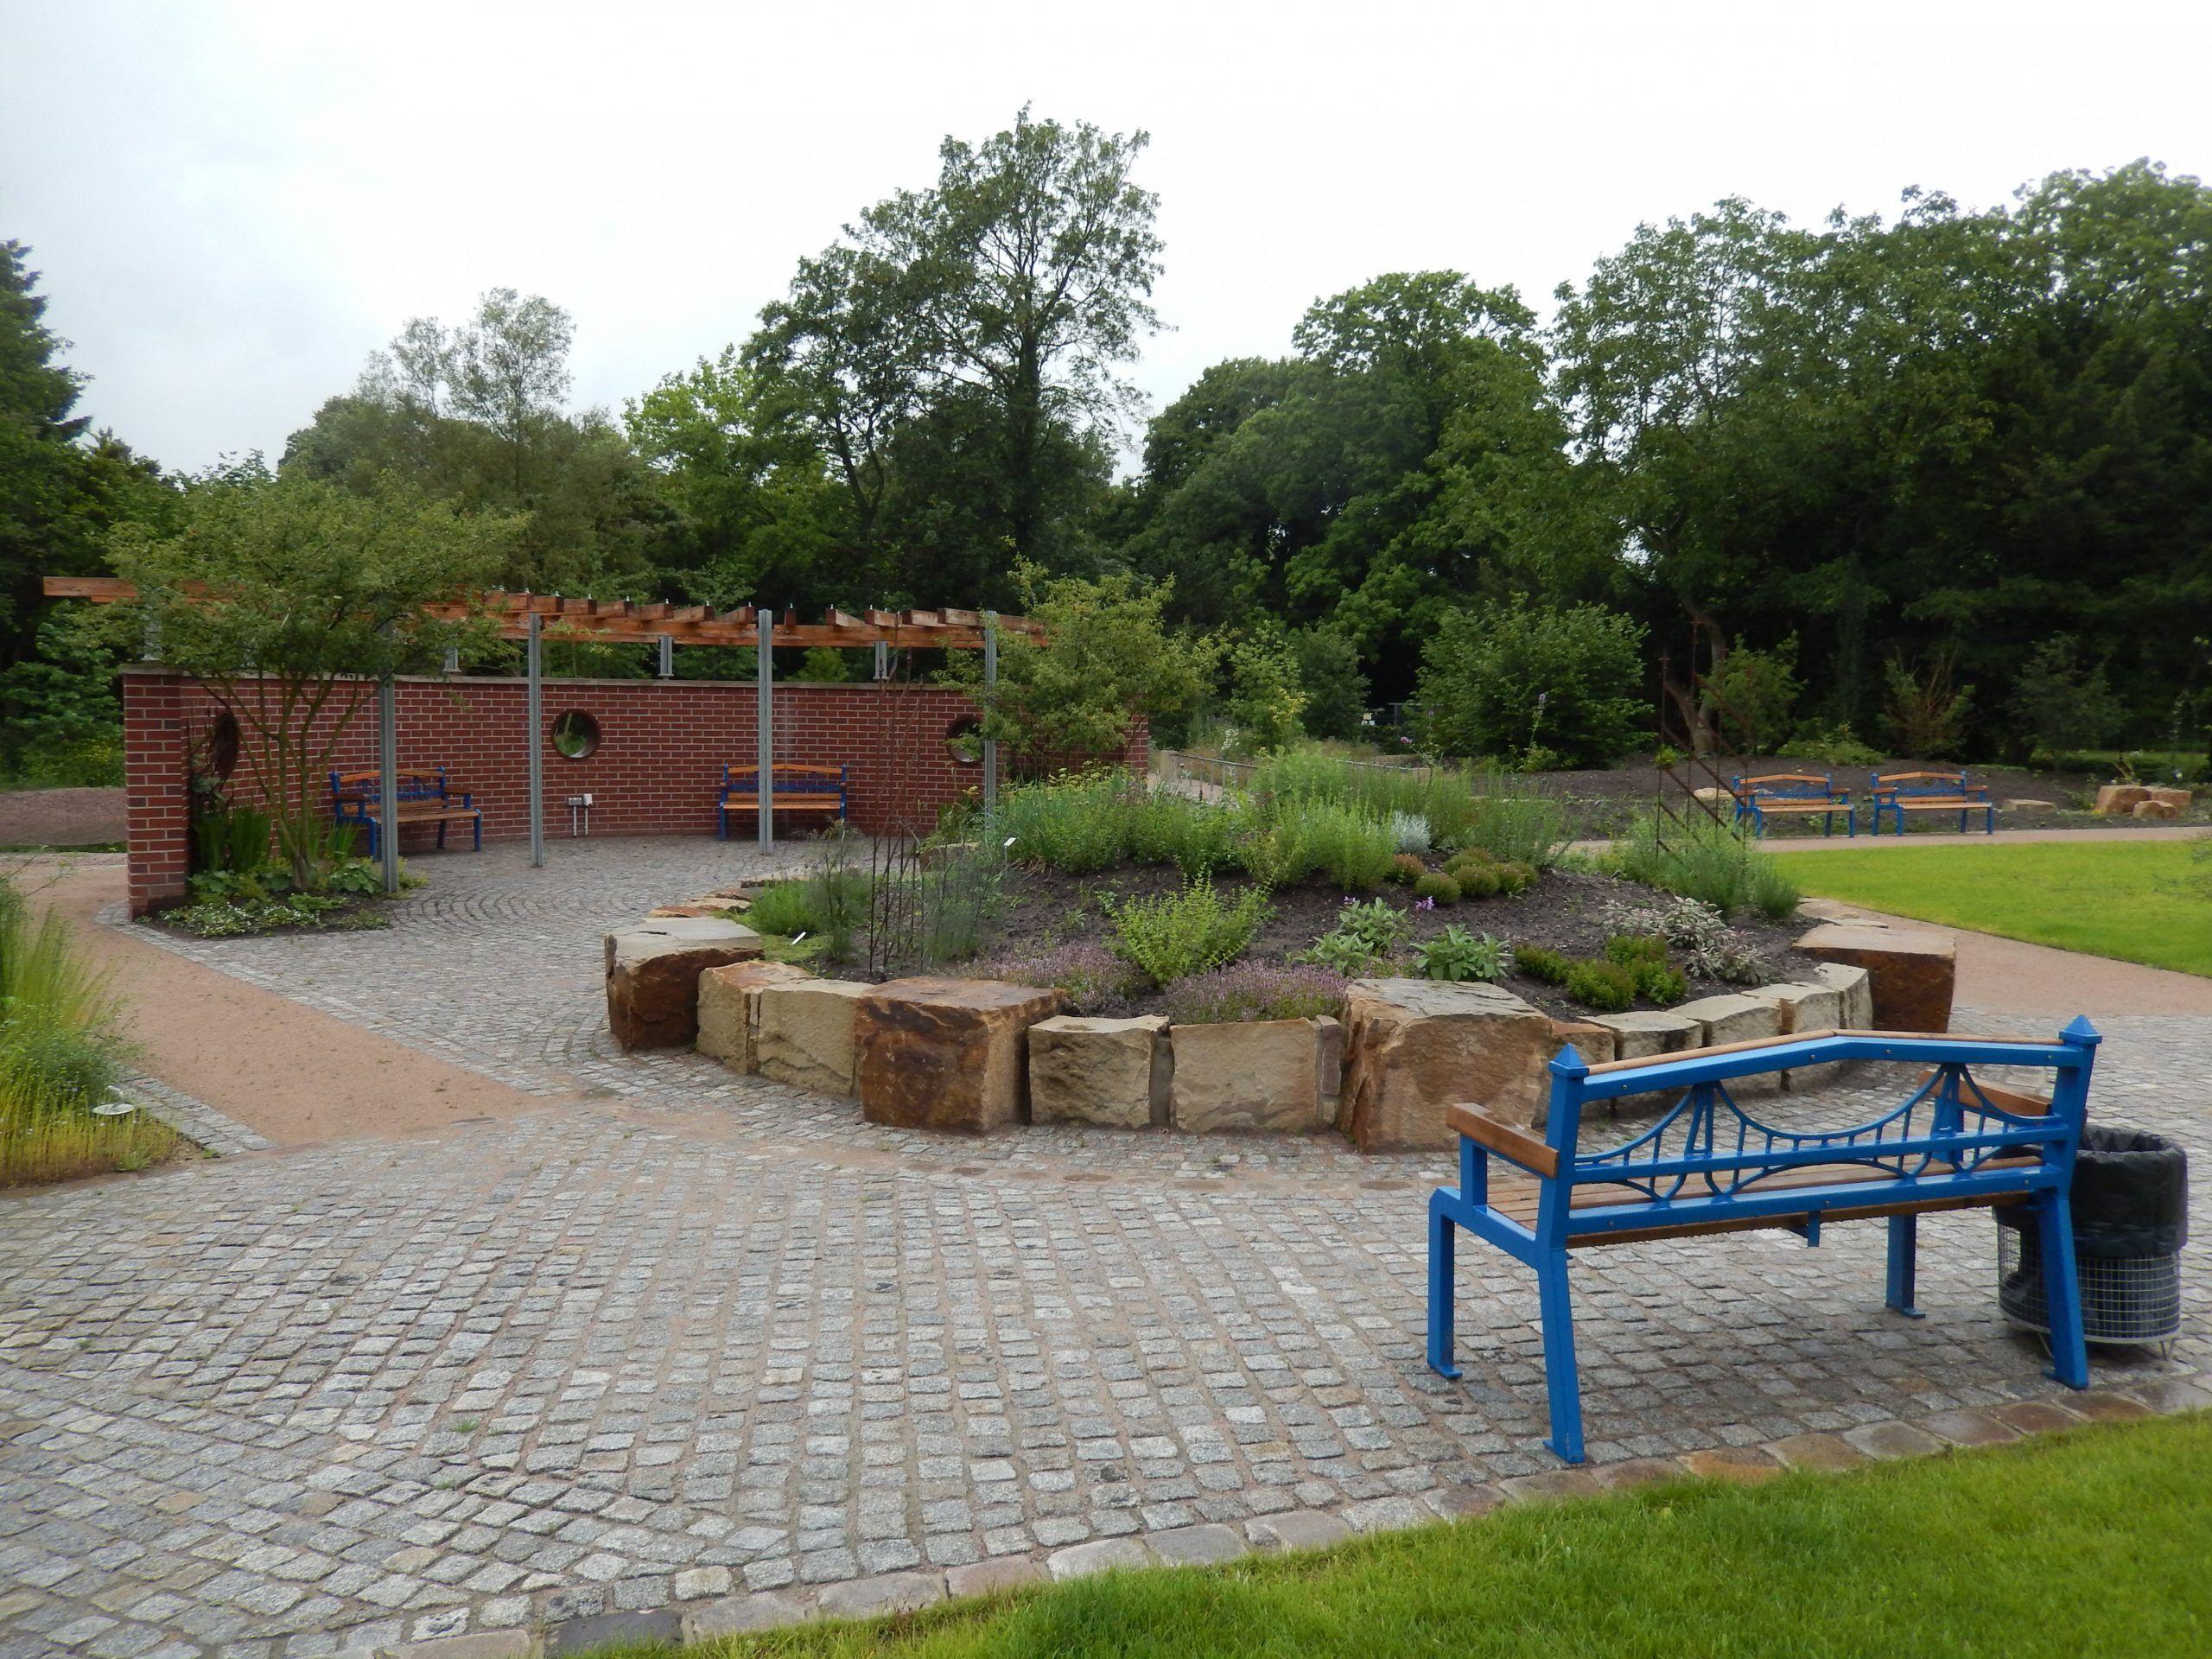 Botanischer Garten Wilhelmshaven Botanischer Garten Garten Garten Ideen